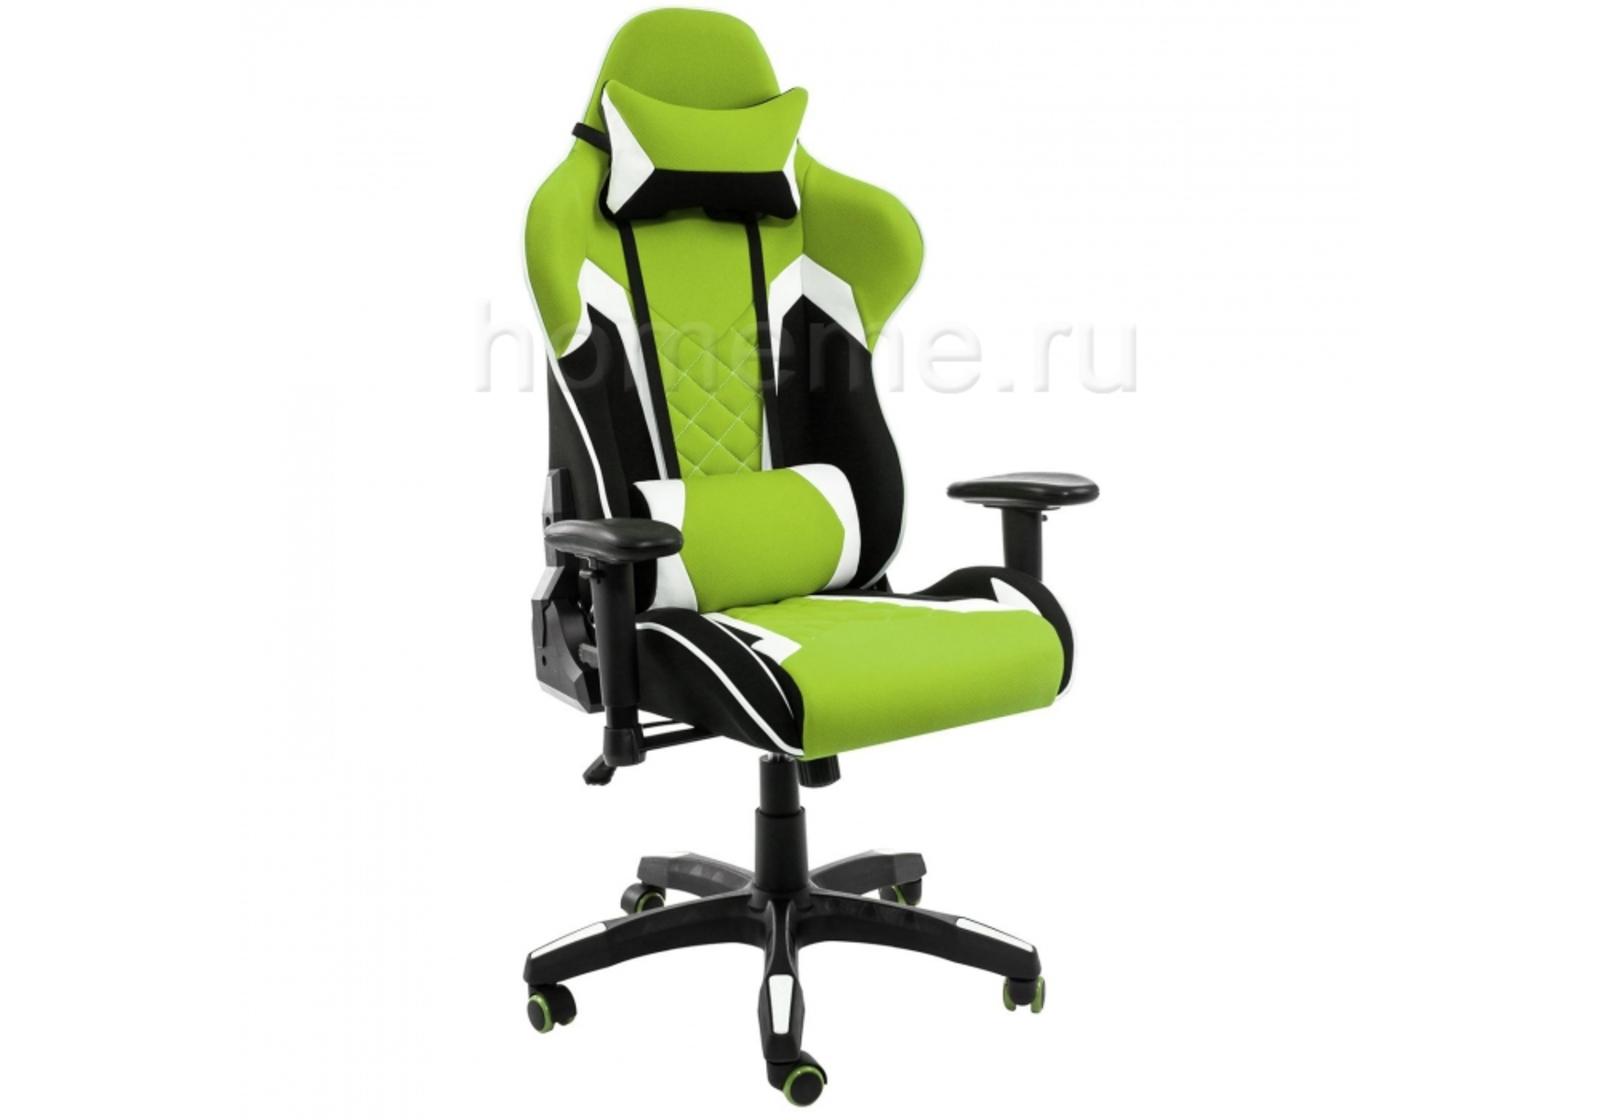 Кресло для офиса HomeMe Prime черное / зеленое 1858 от Homeme.ru